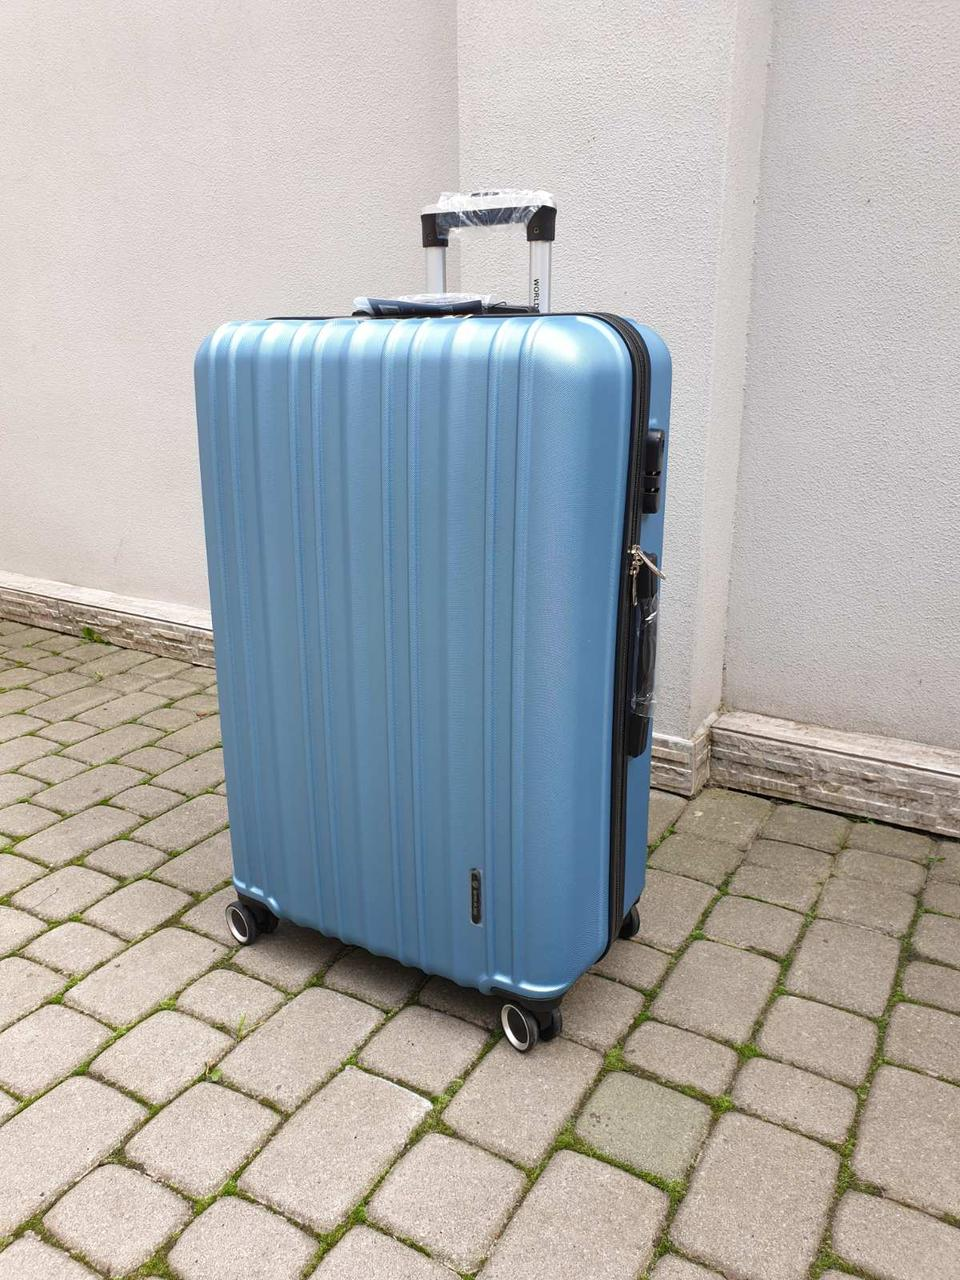 WORDLINE 623 ( AIRTEX ) Франція валізи чемодани сумки на колесах